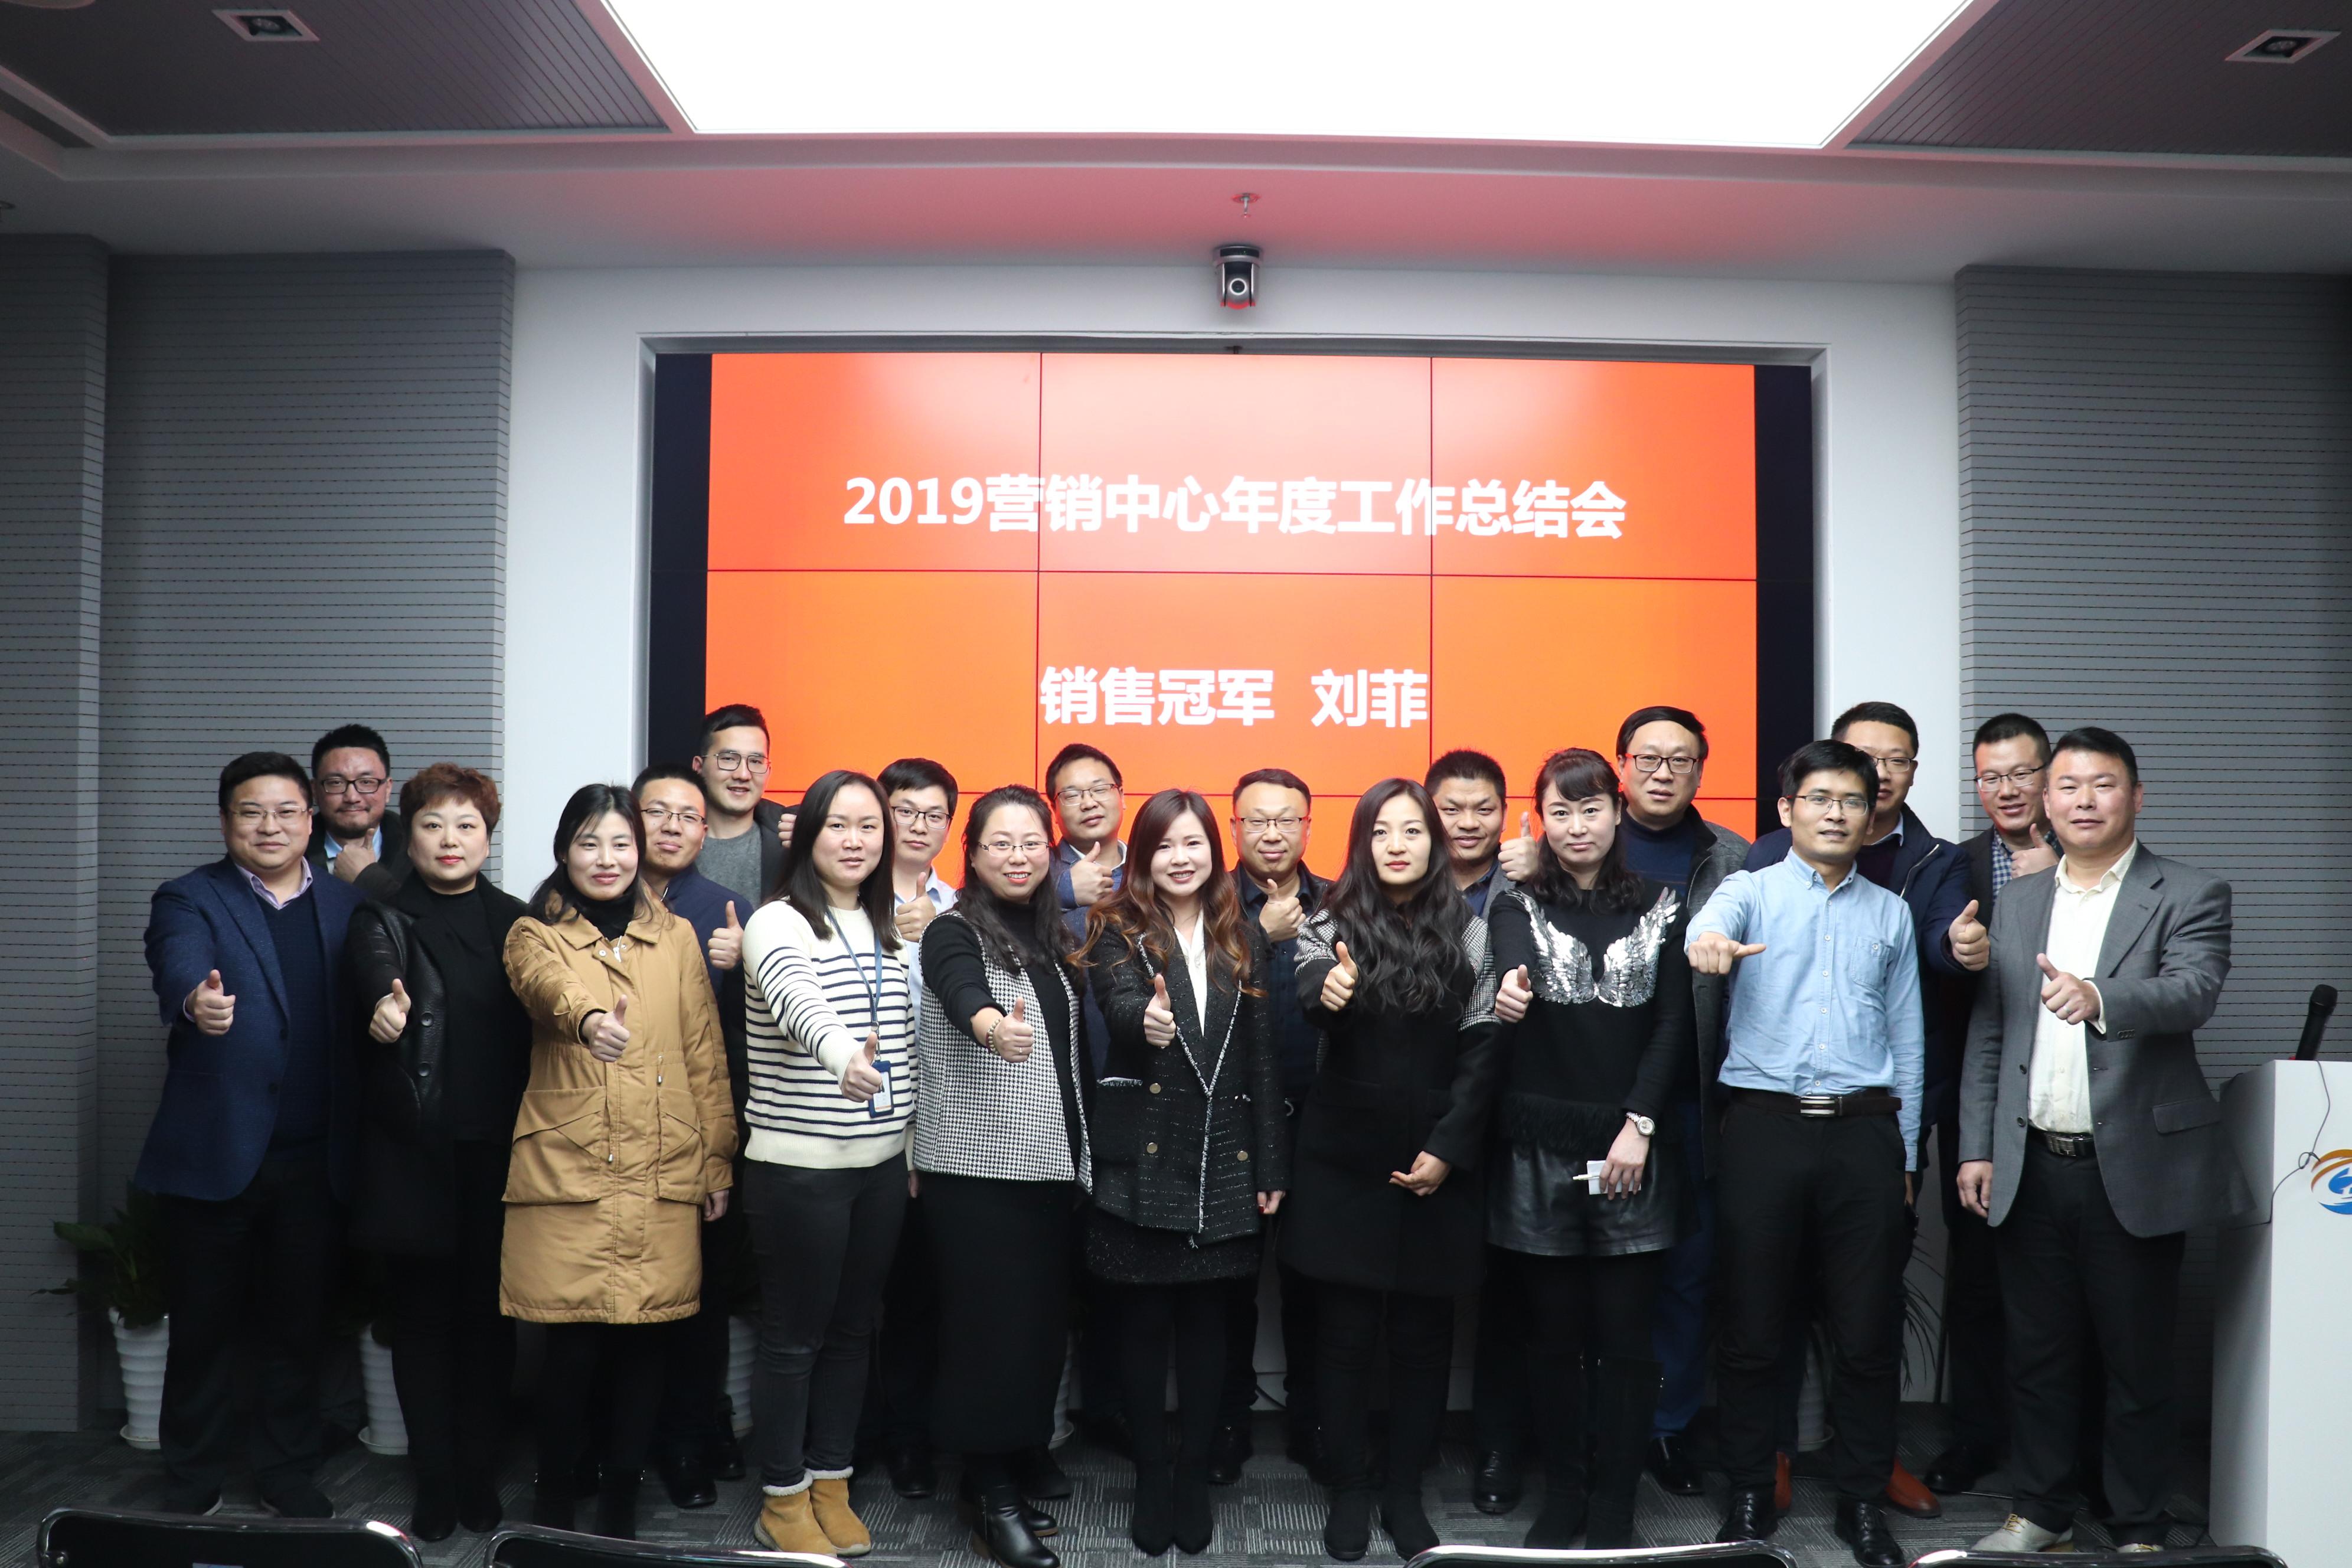 <b>新利官方网站下载动态 2019营销中心年度工作总结会圆满落幕</b>